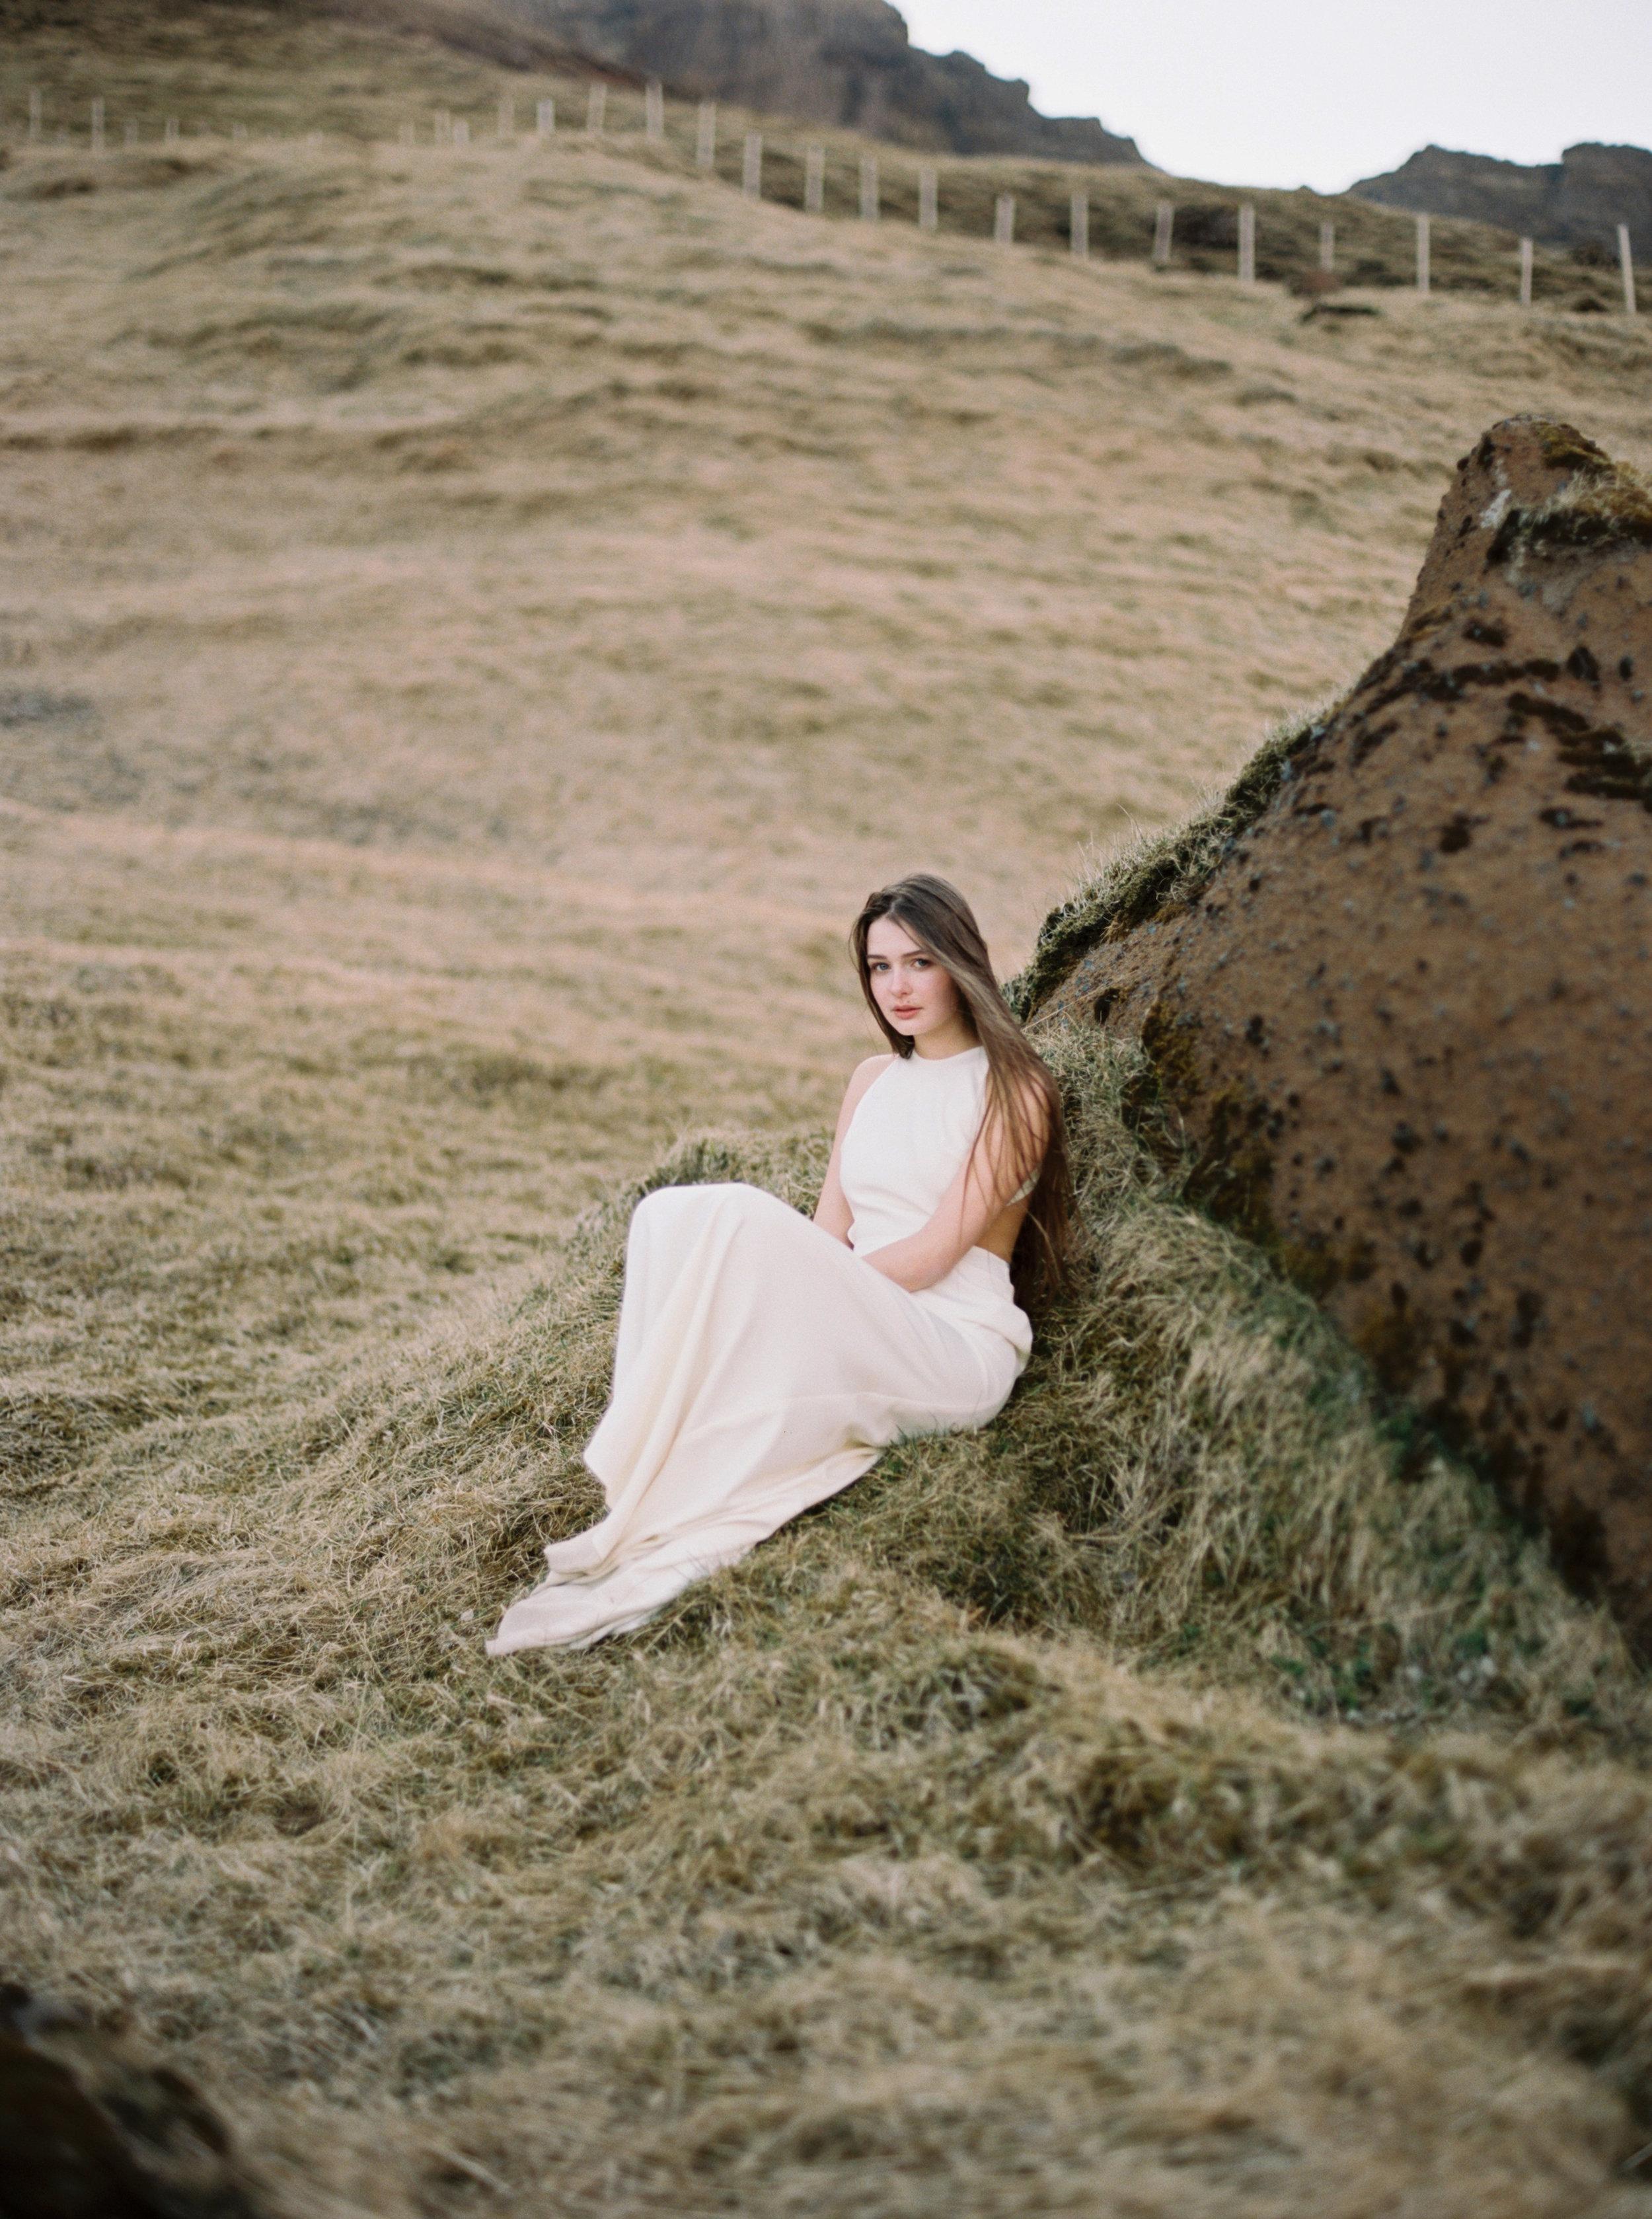 Kyle John l Fine Art Wedding Photography l Chicago, Copenhagen, California, New York, Destination l Blog l Part Four_Iceland_22